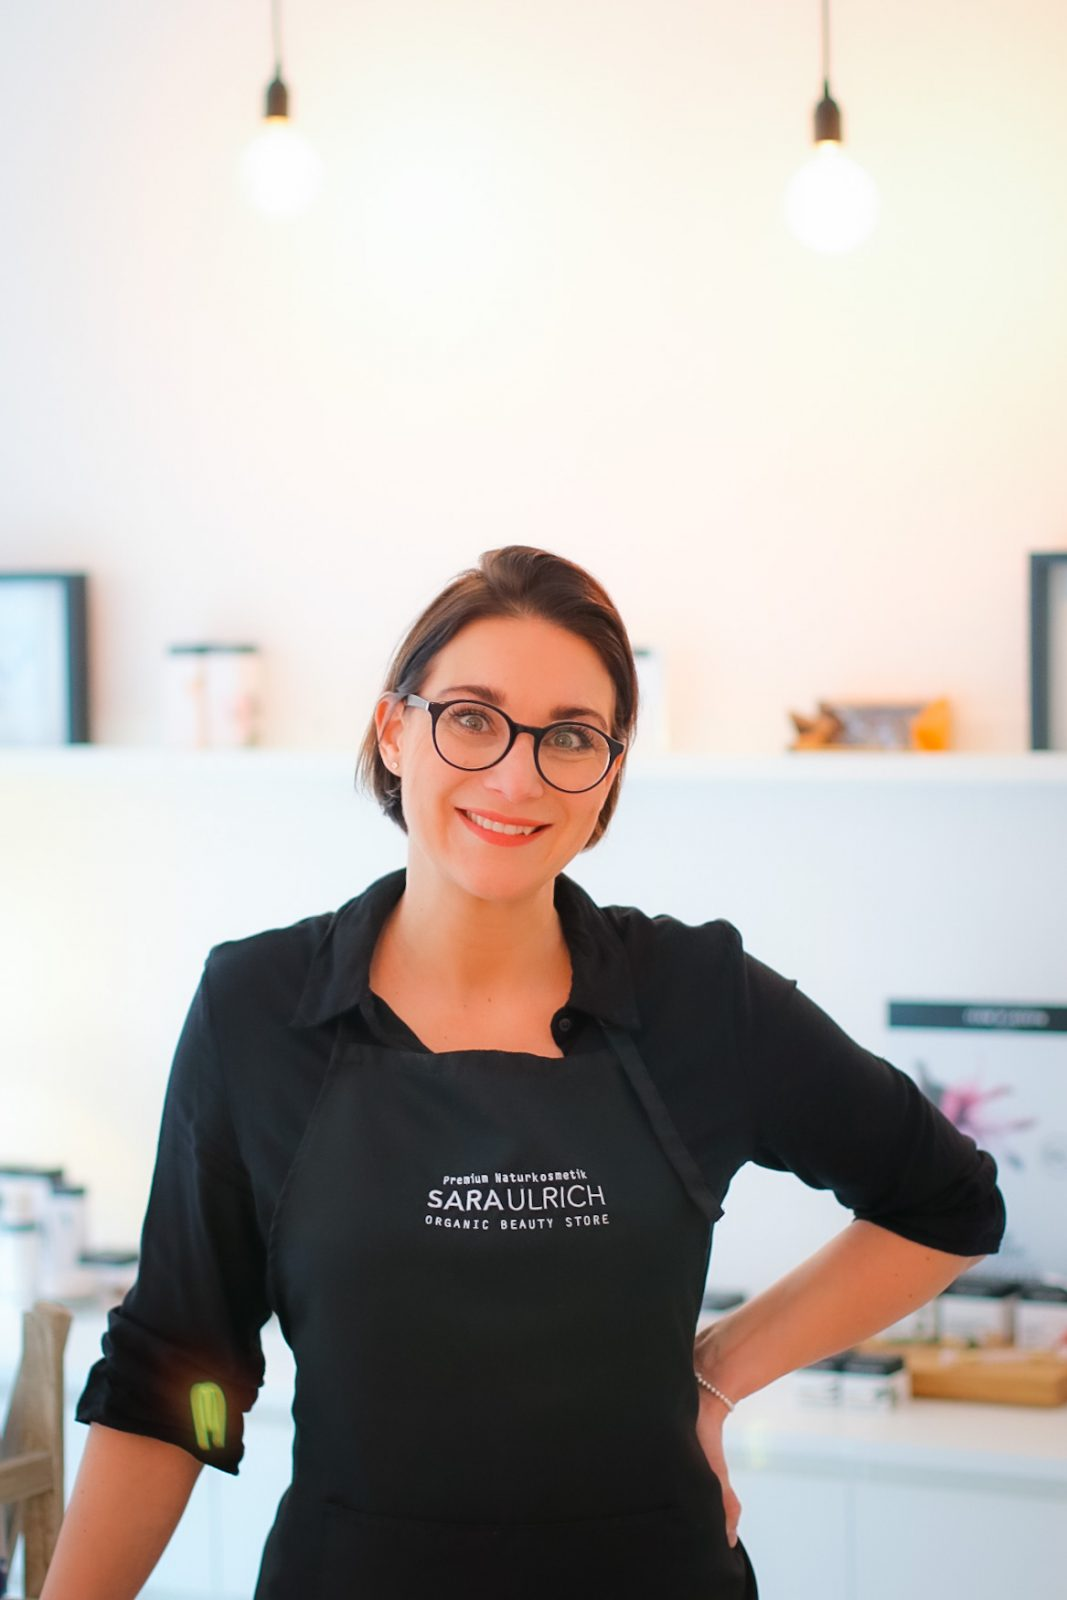 Sara Rolles Gründerin Organic Beauty Store & Spa in Saarbrücken